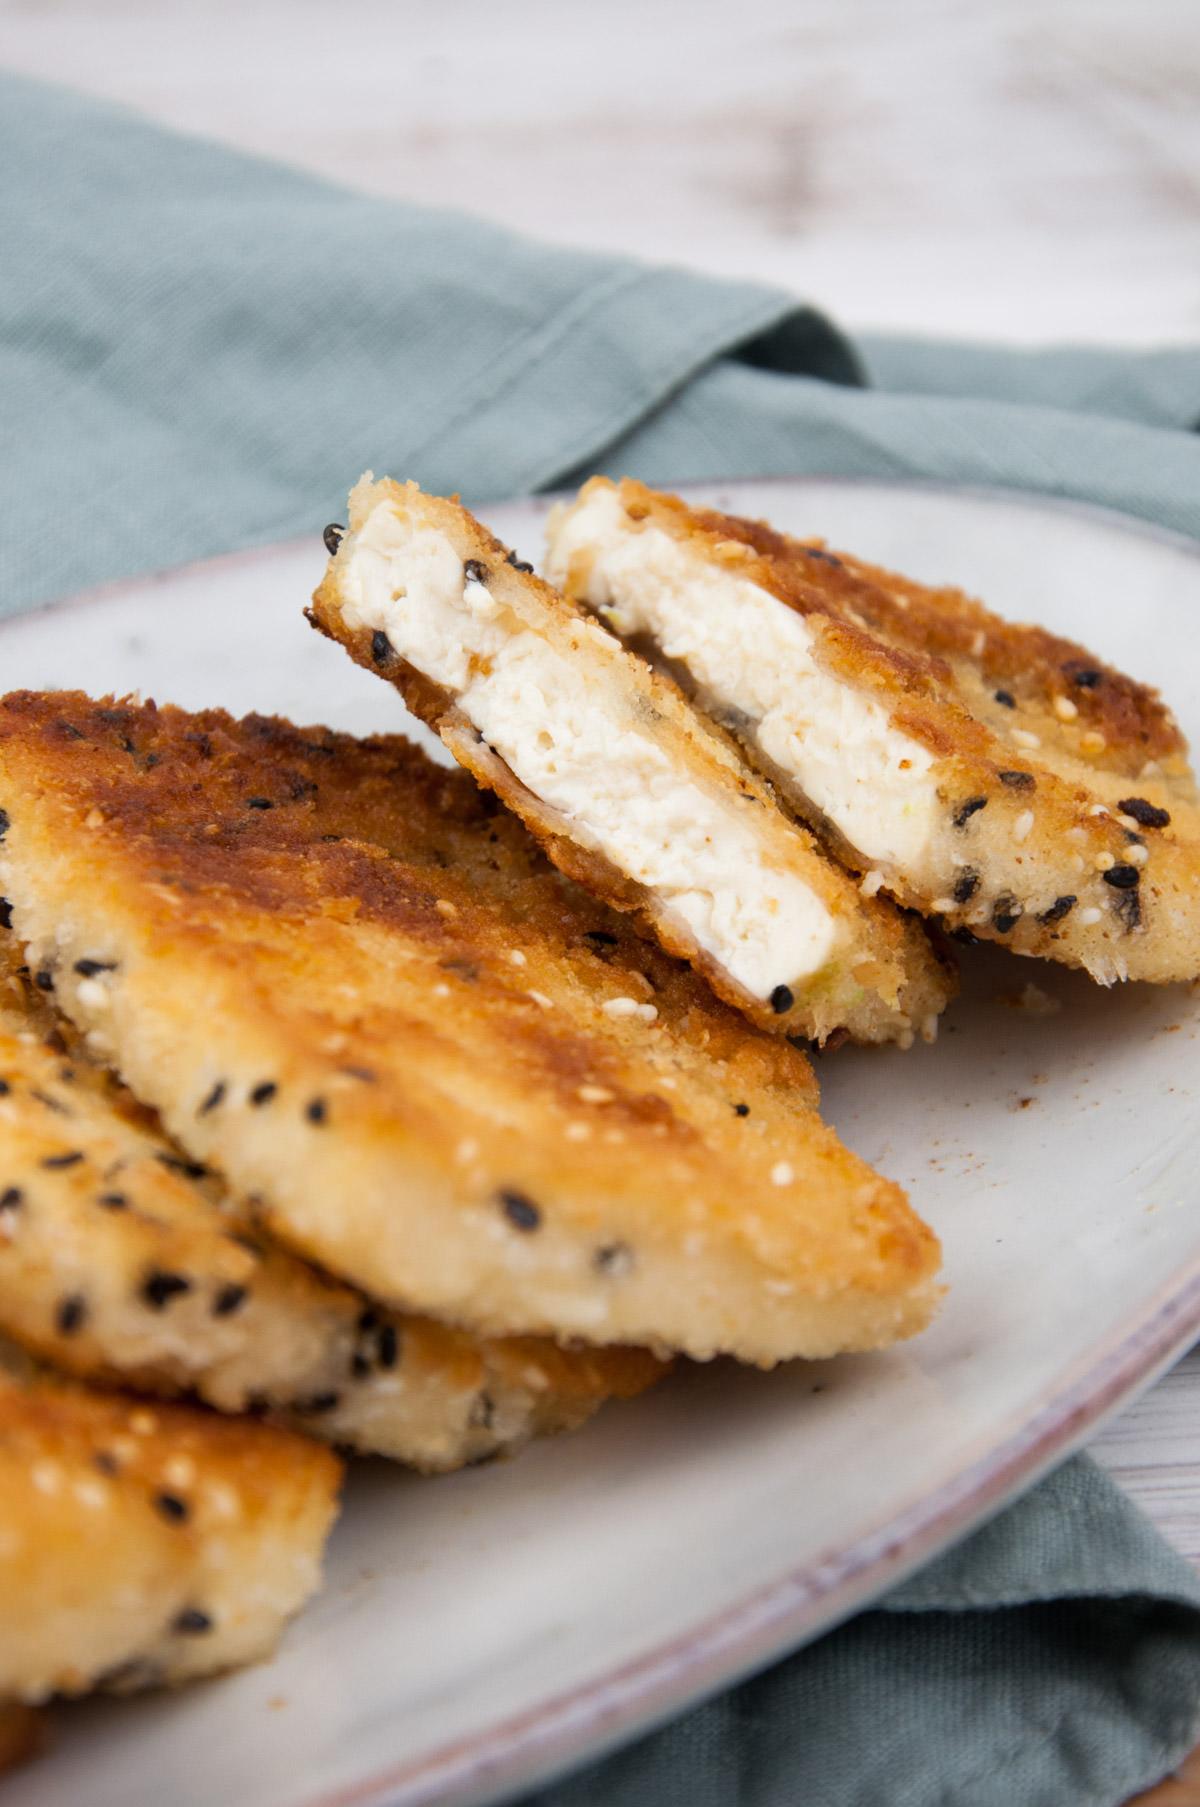 Tofu Katsu - Breaded Tofu